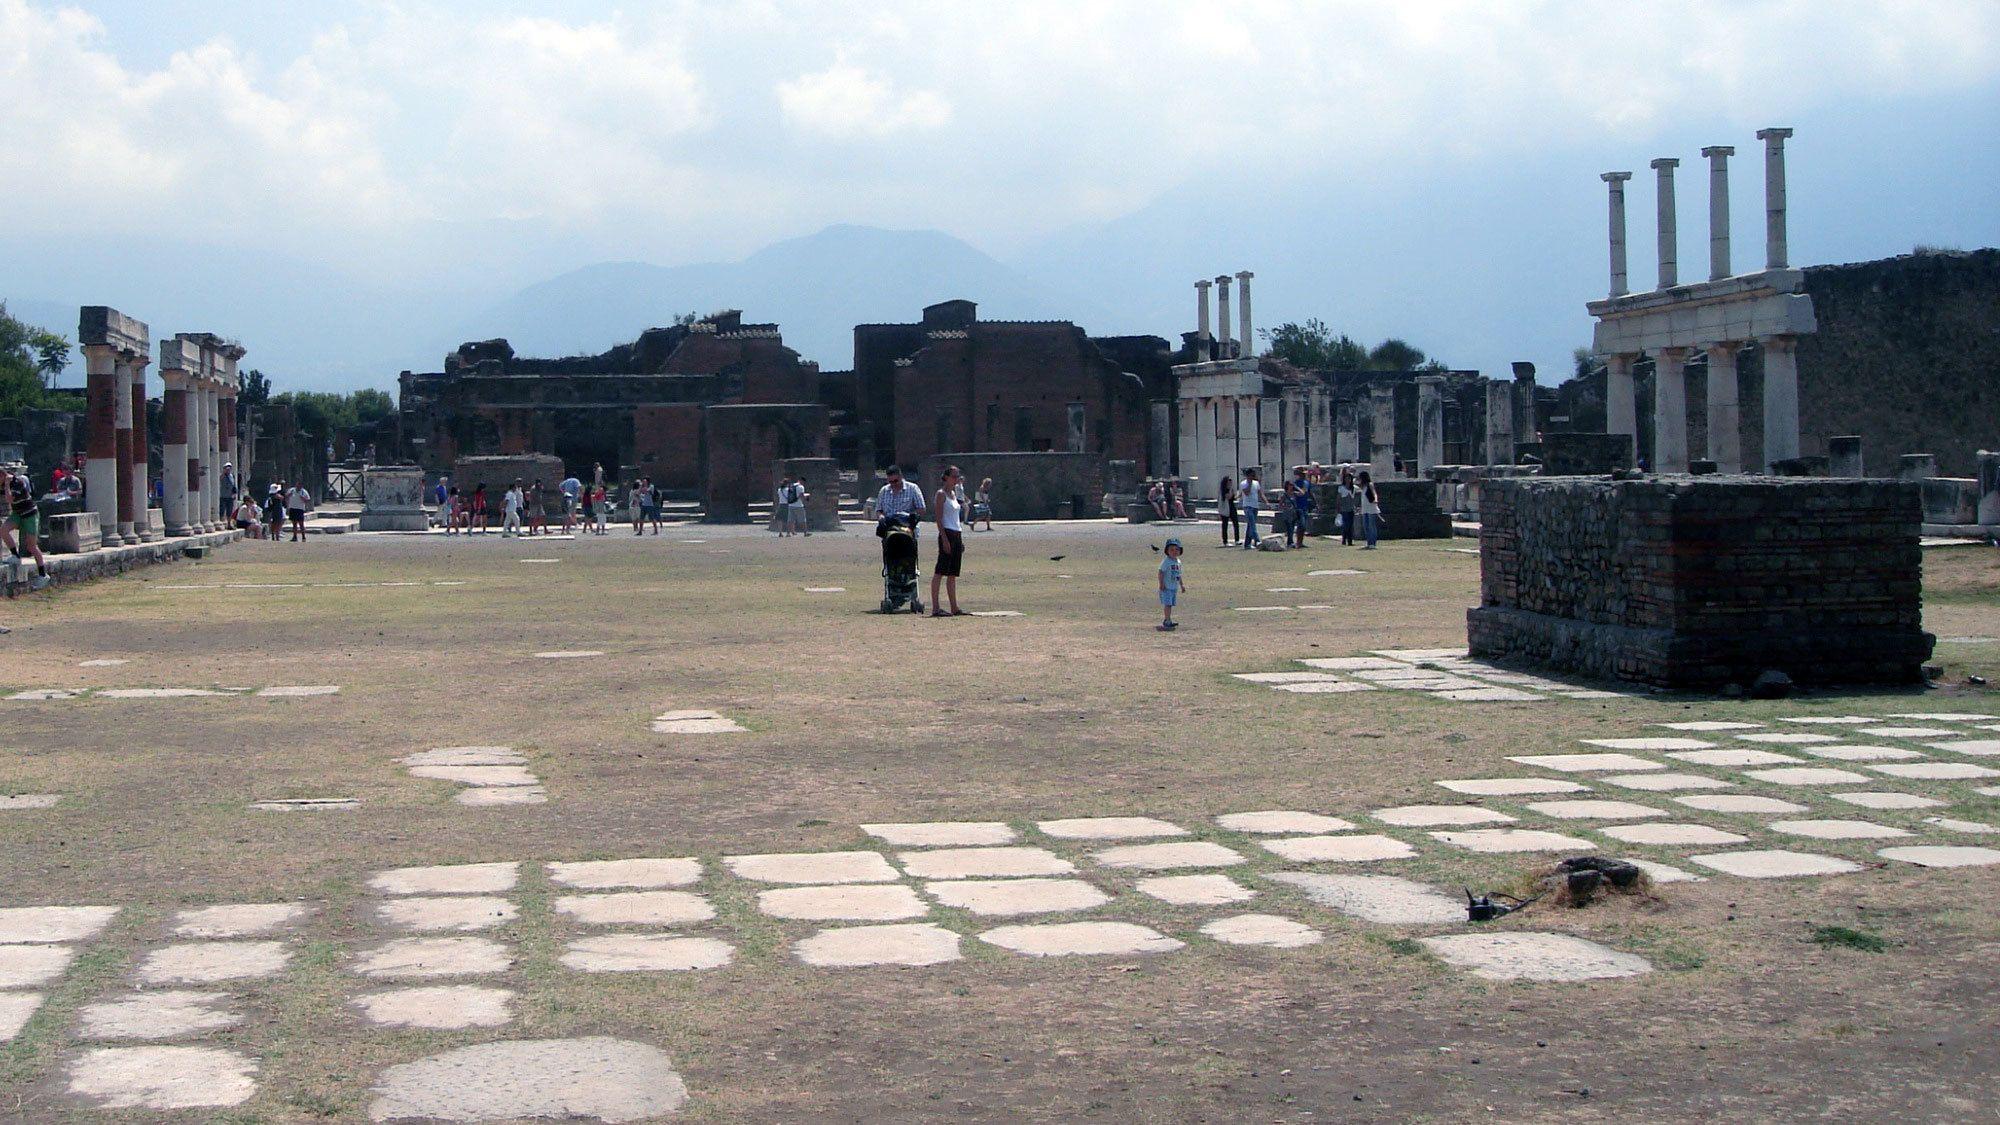 People walking among the ruins of Pompeii